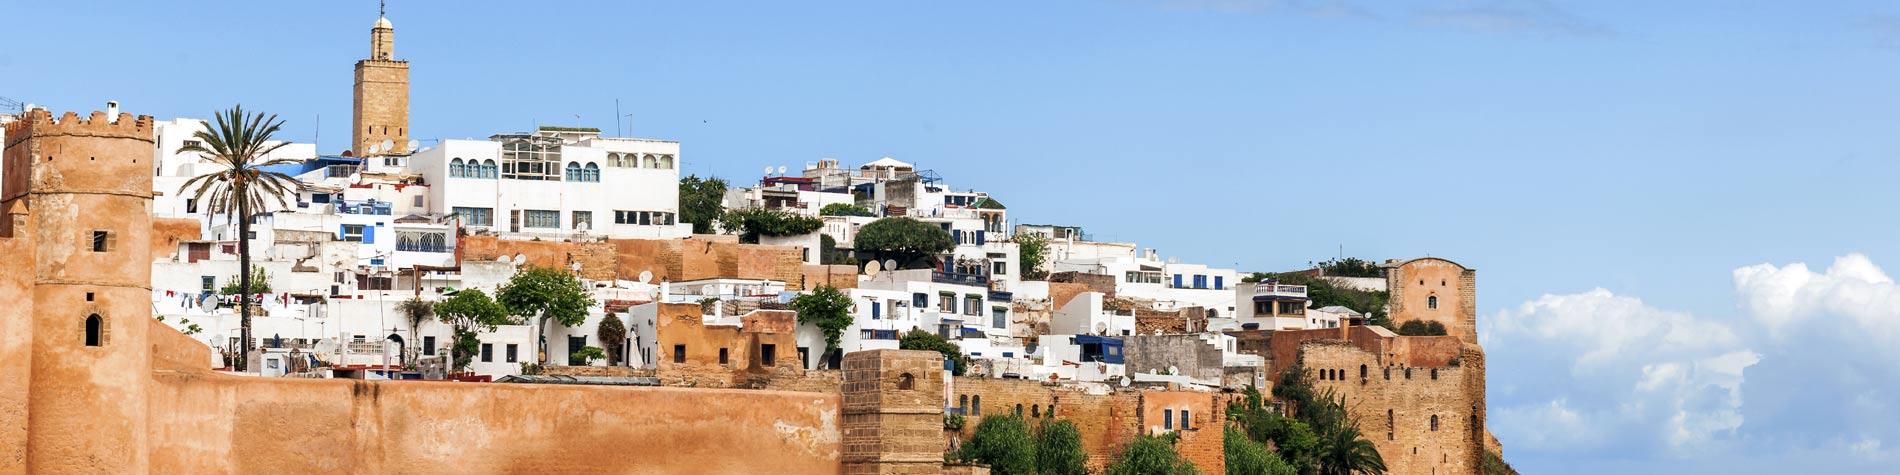 MO_Rabat_City_4 1